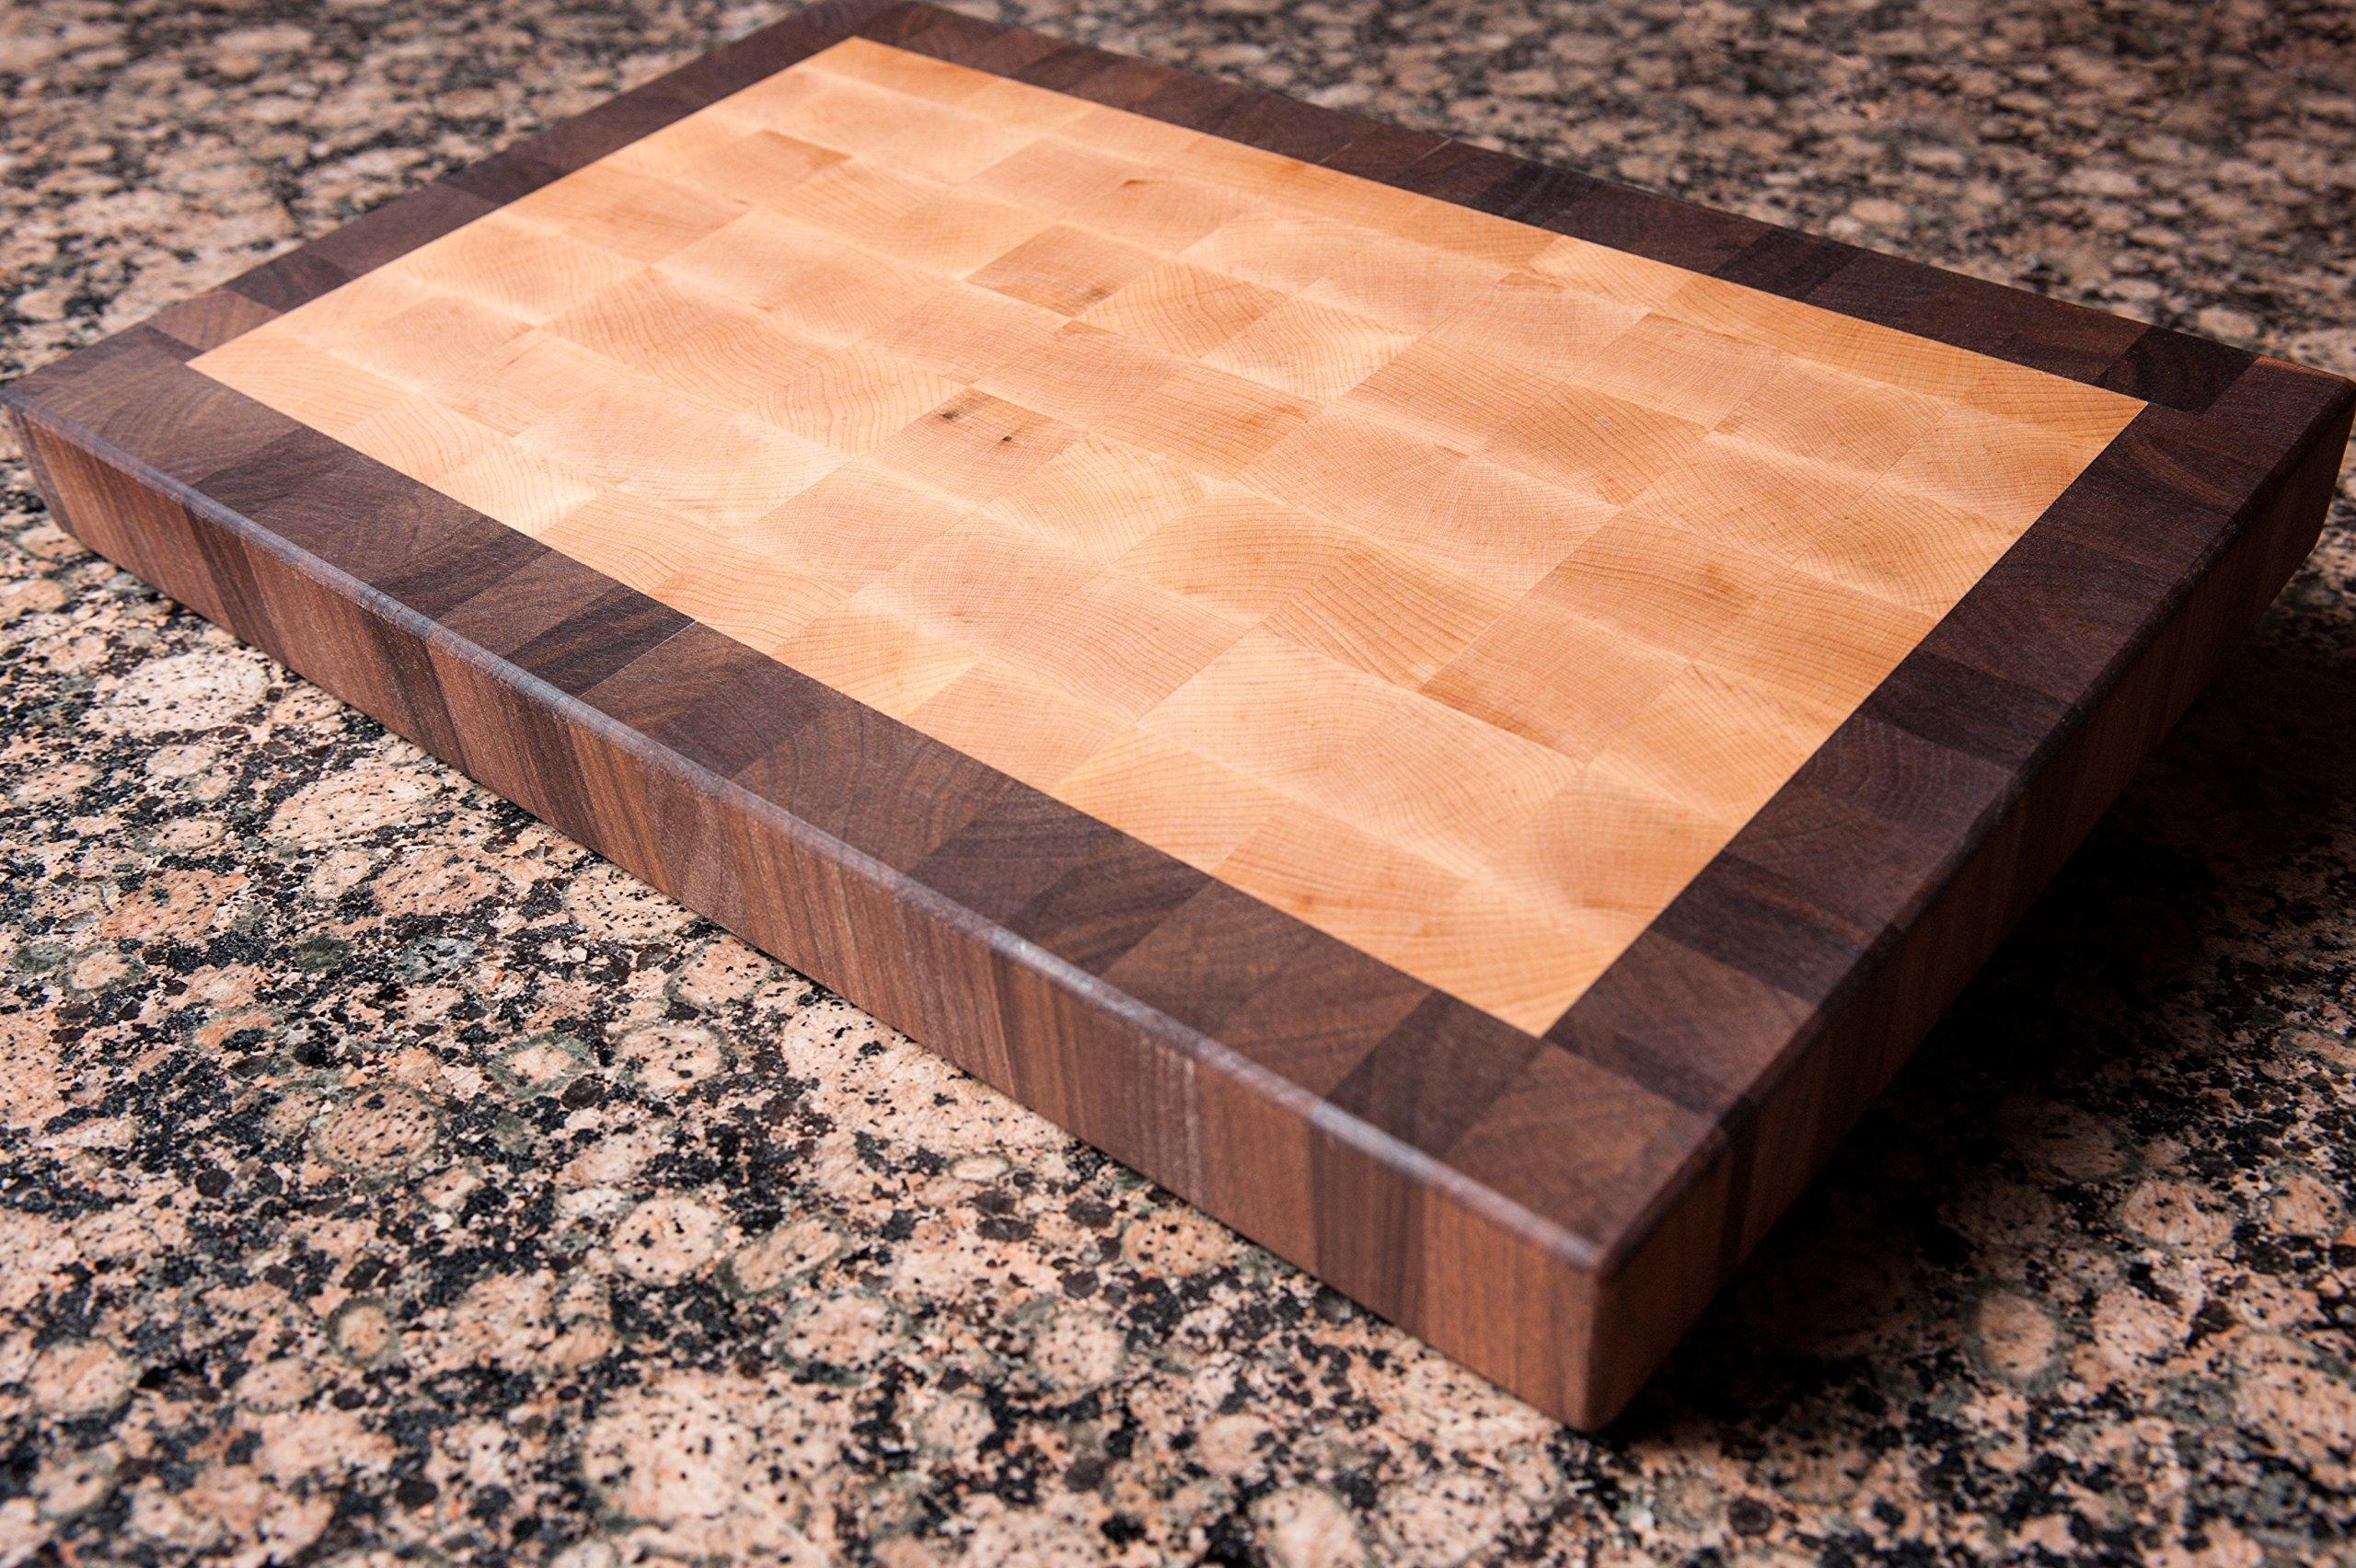 Chopping Blox Walnut and Maple End Grain Handmade Wood Cutting Board Large - (SIXM-M)